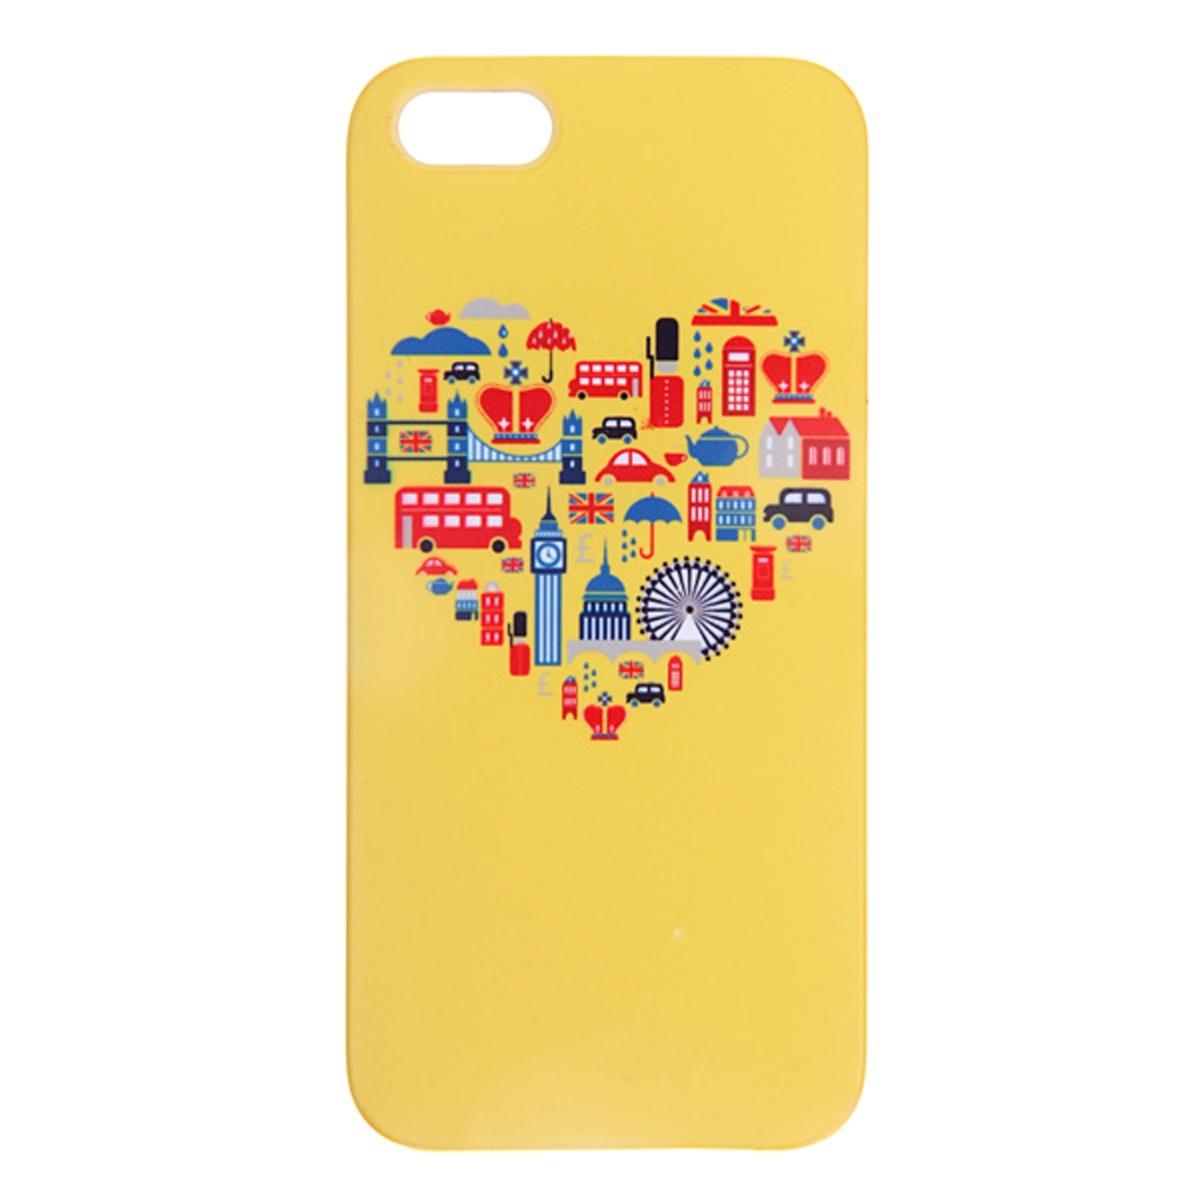 Чехол для сотового телефона Mitya Veselkov IP5.MITYA, IP5.МITYA-034, желтый